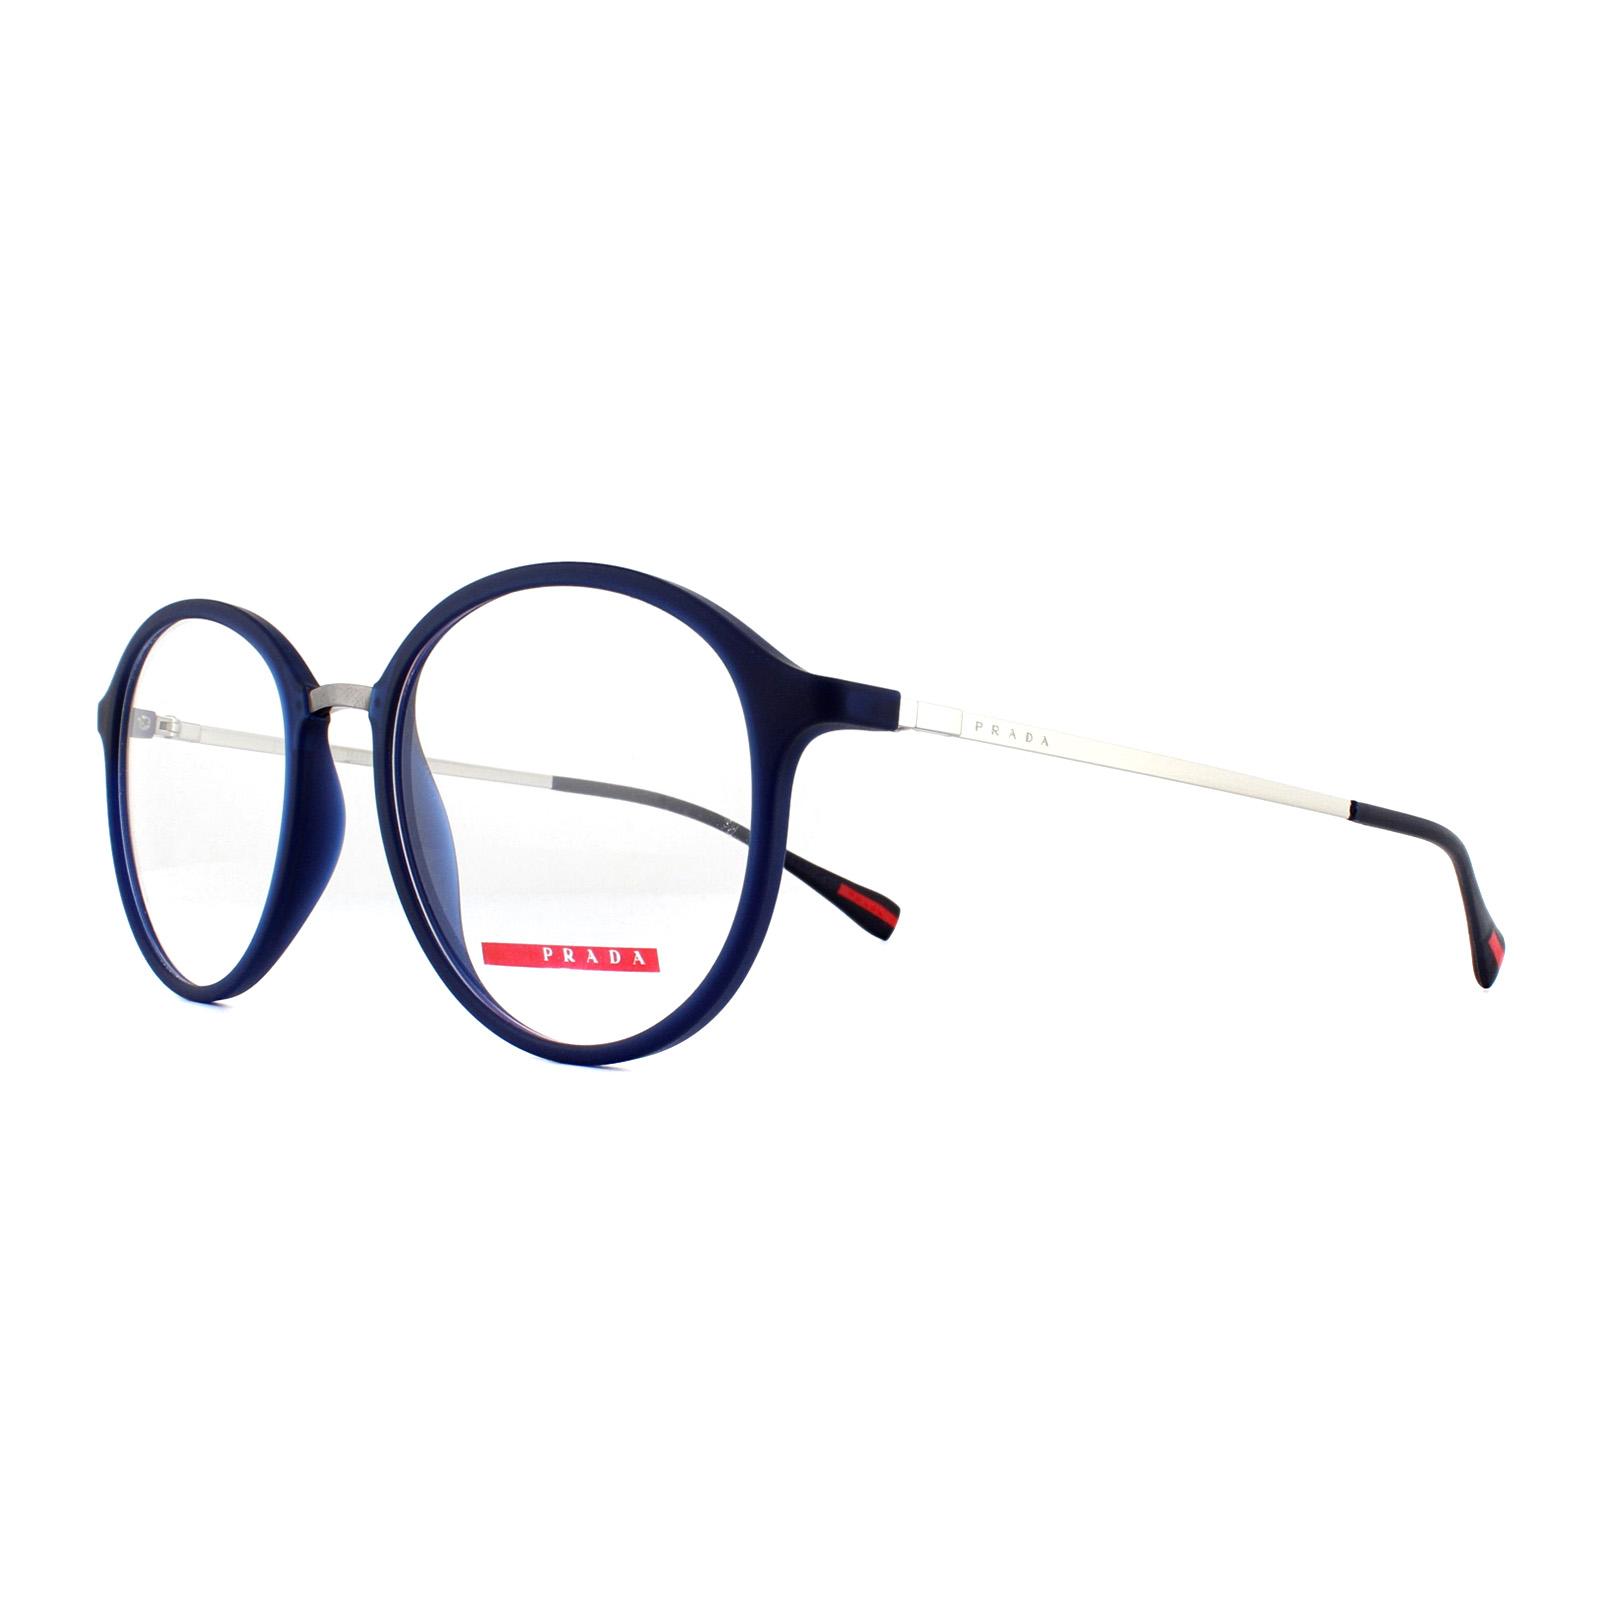 c421d5a502 Sentinel Prada Sport Glasses Frames PS 01IV U631O1 Blue Rubber 53mm Mens